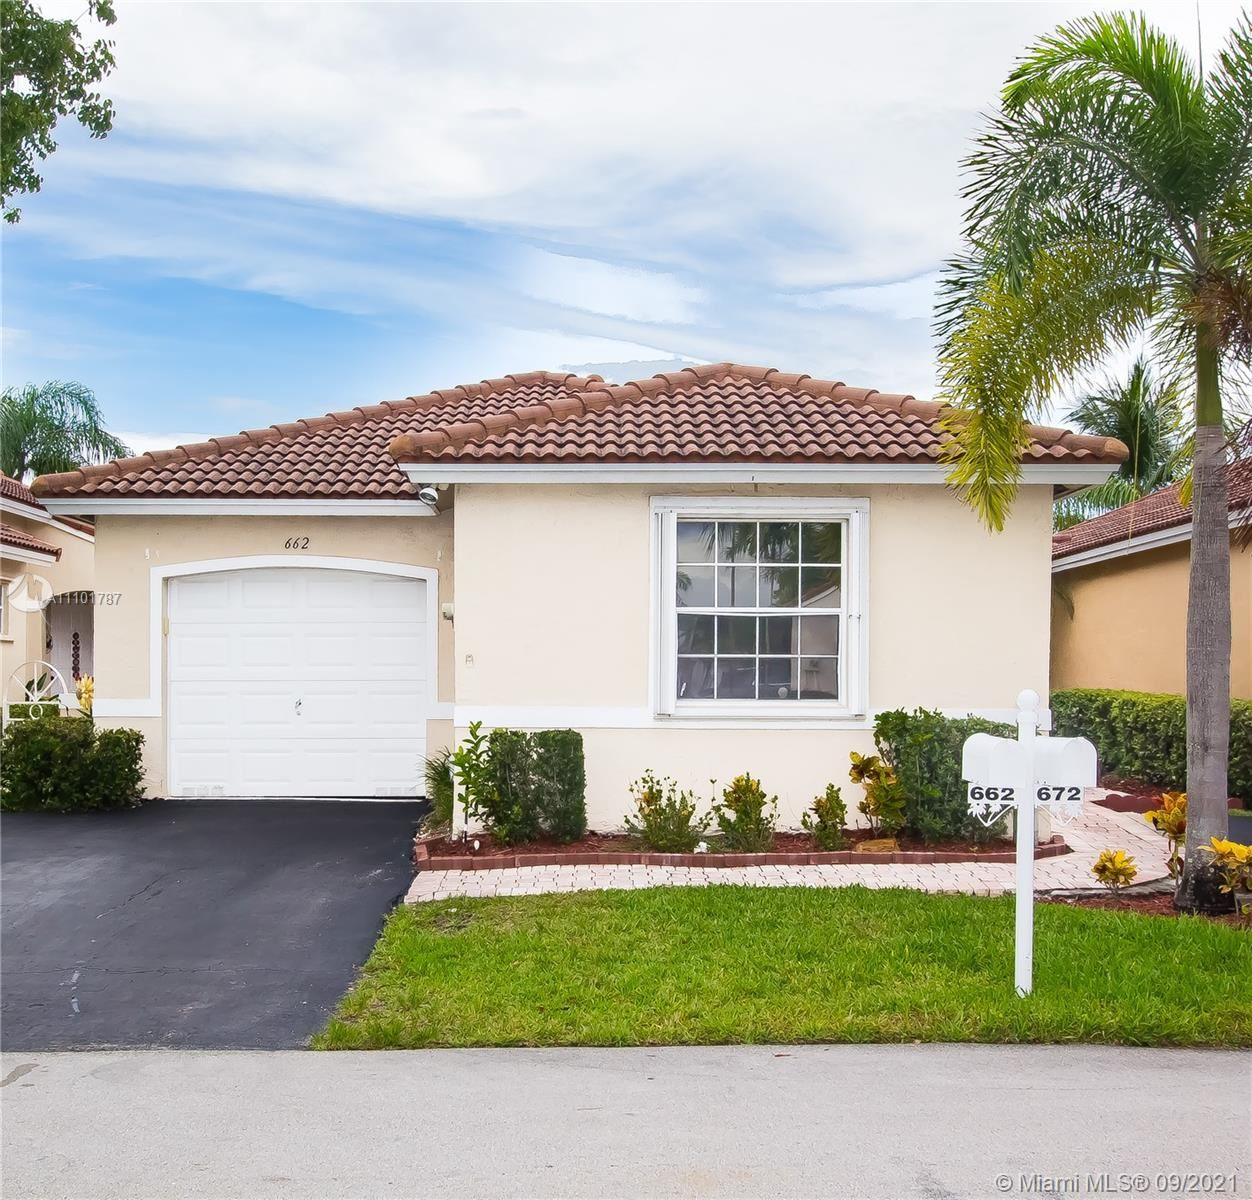 662 NW 173rd Terrace, Pembroke Pines, FL 33029 - #: A11101787